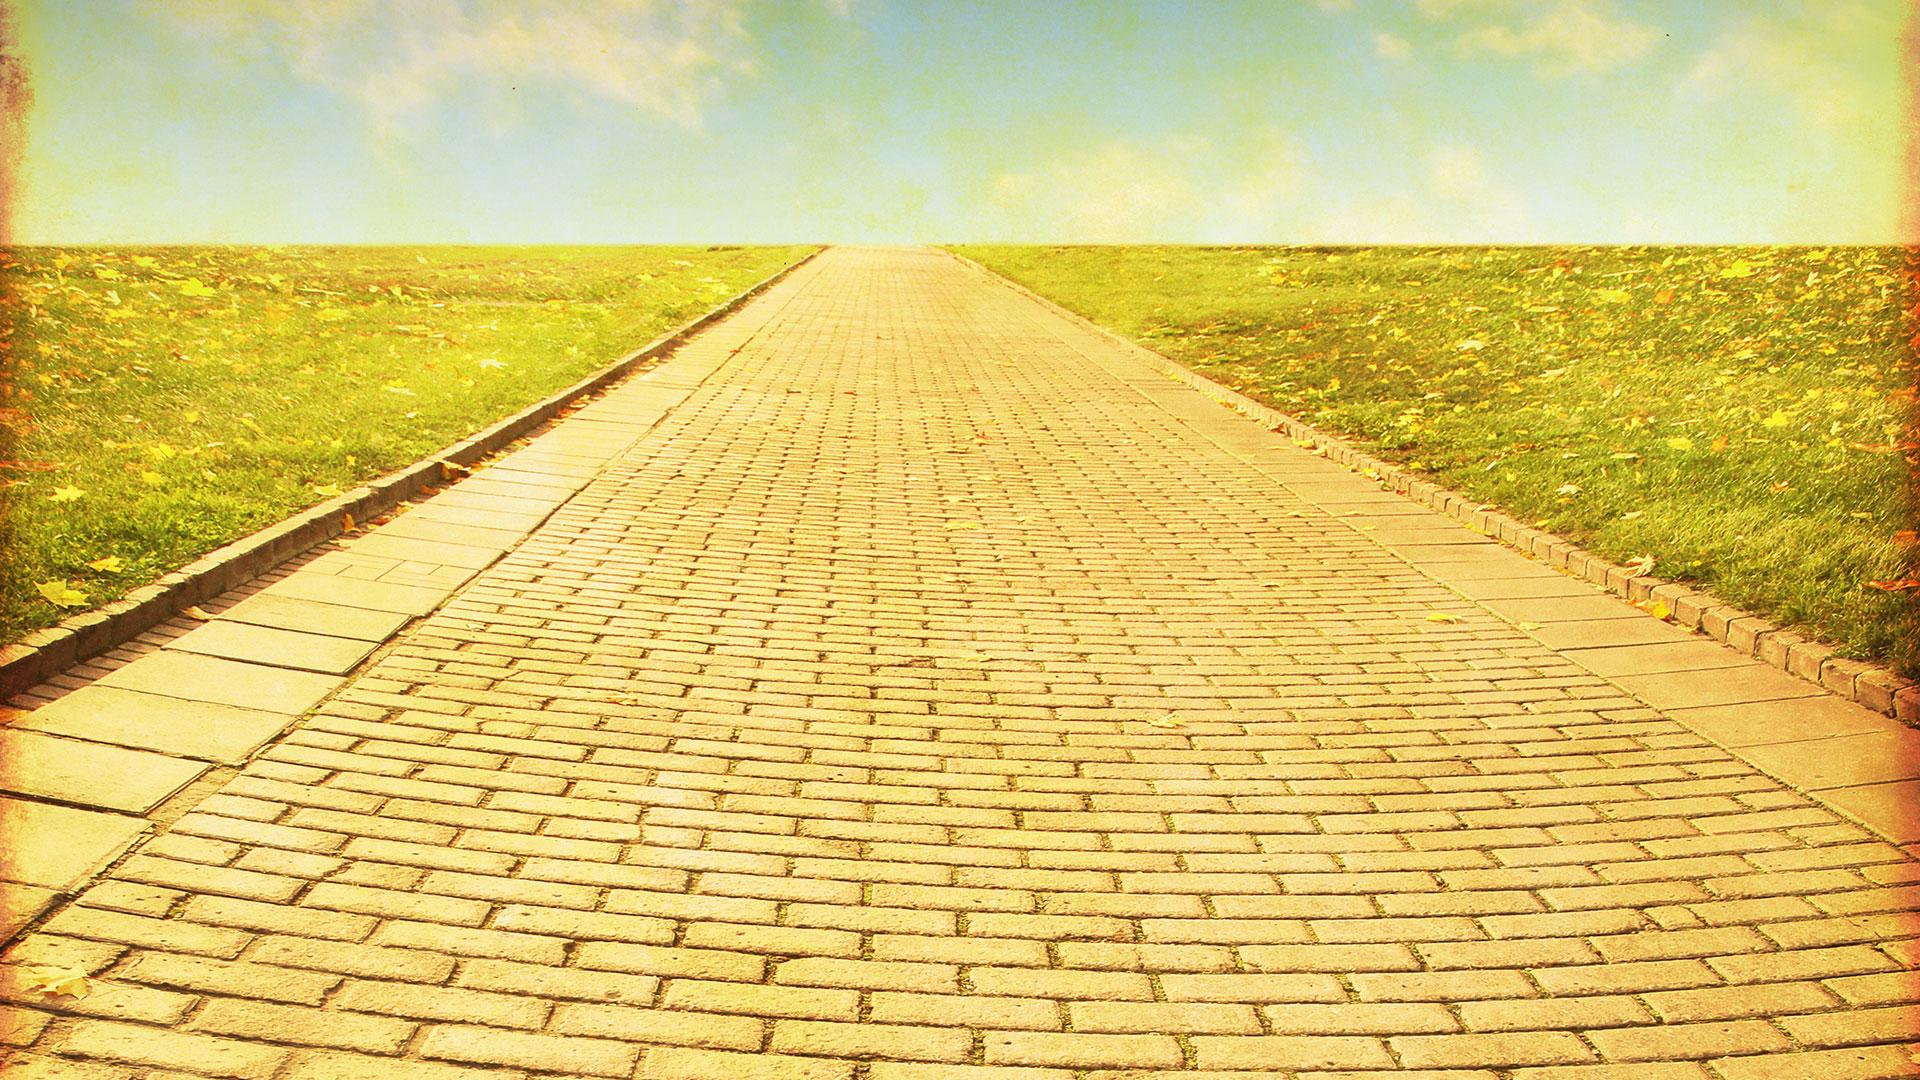 yellow-brick-road-oz-ss-1920